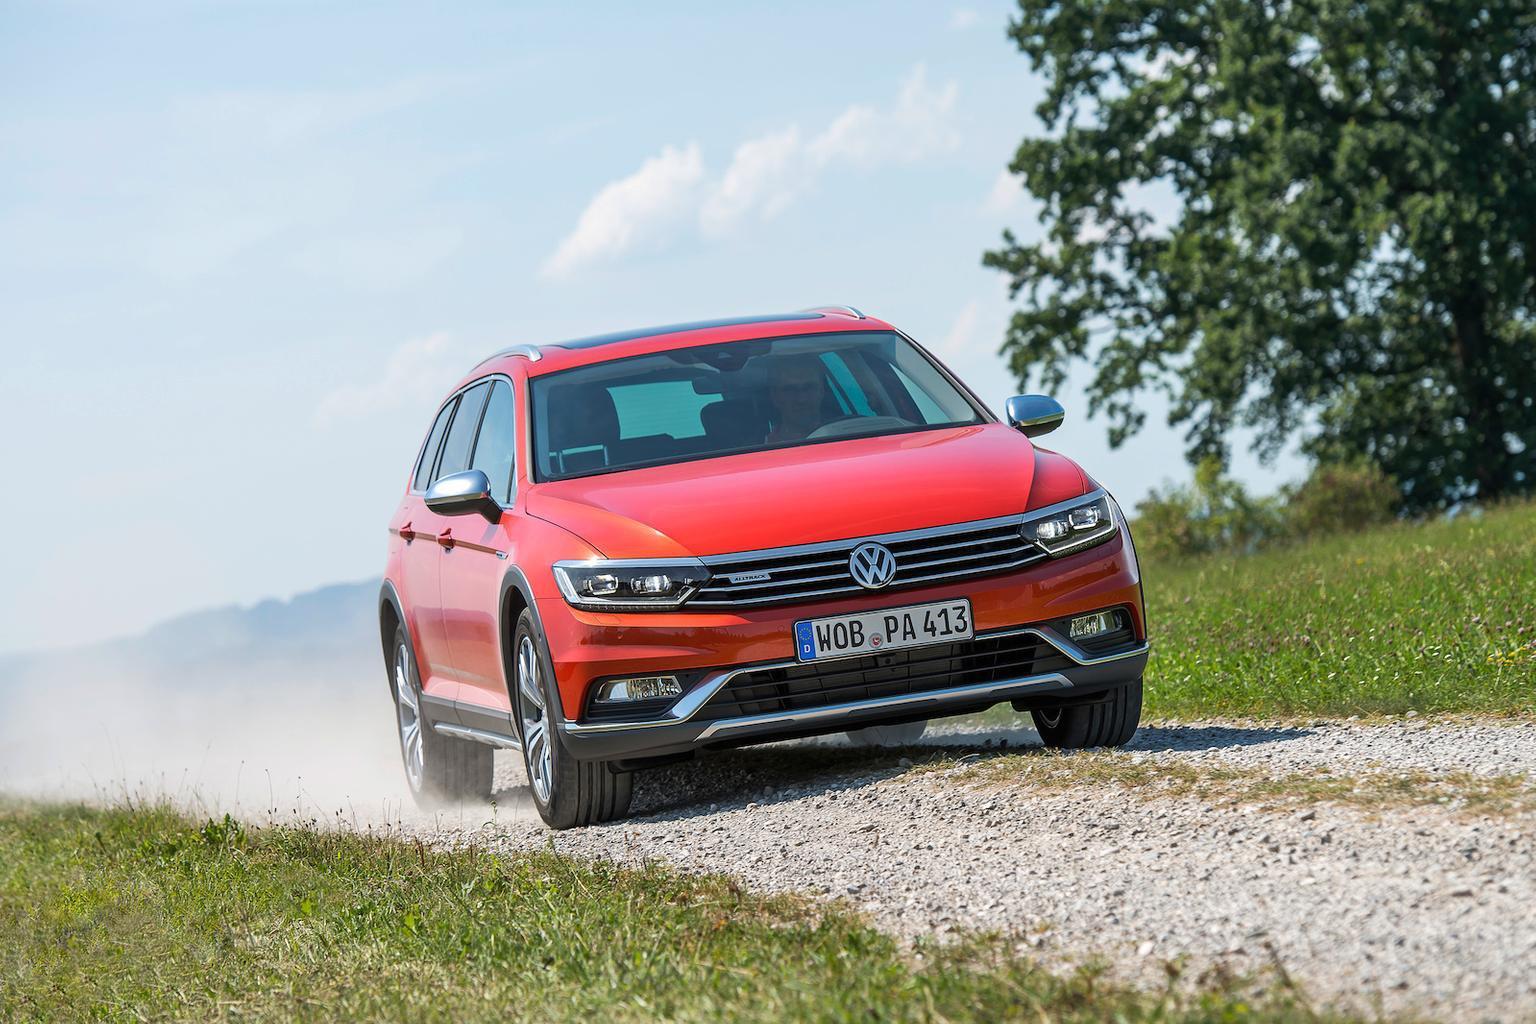 2015 VW Passat Alltrack 2.0 TDI 150 review